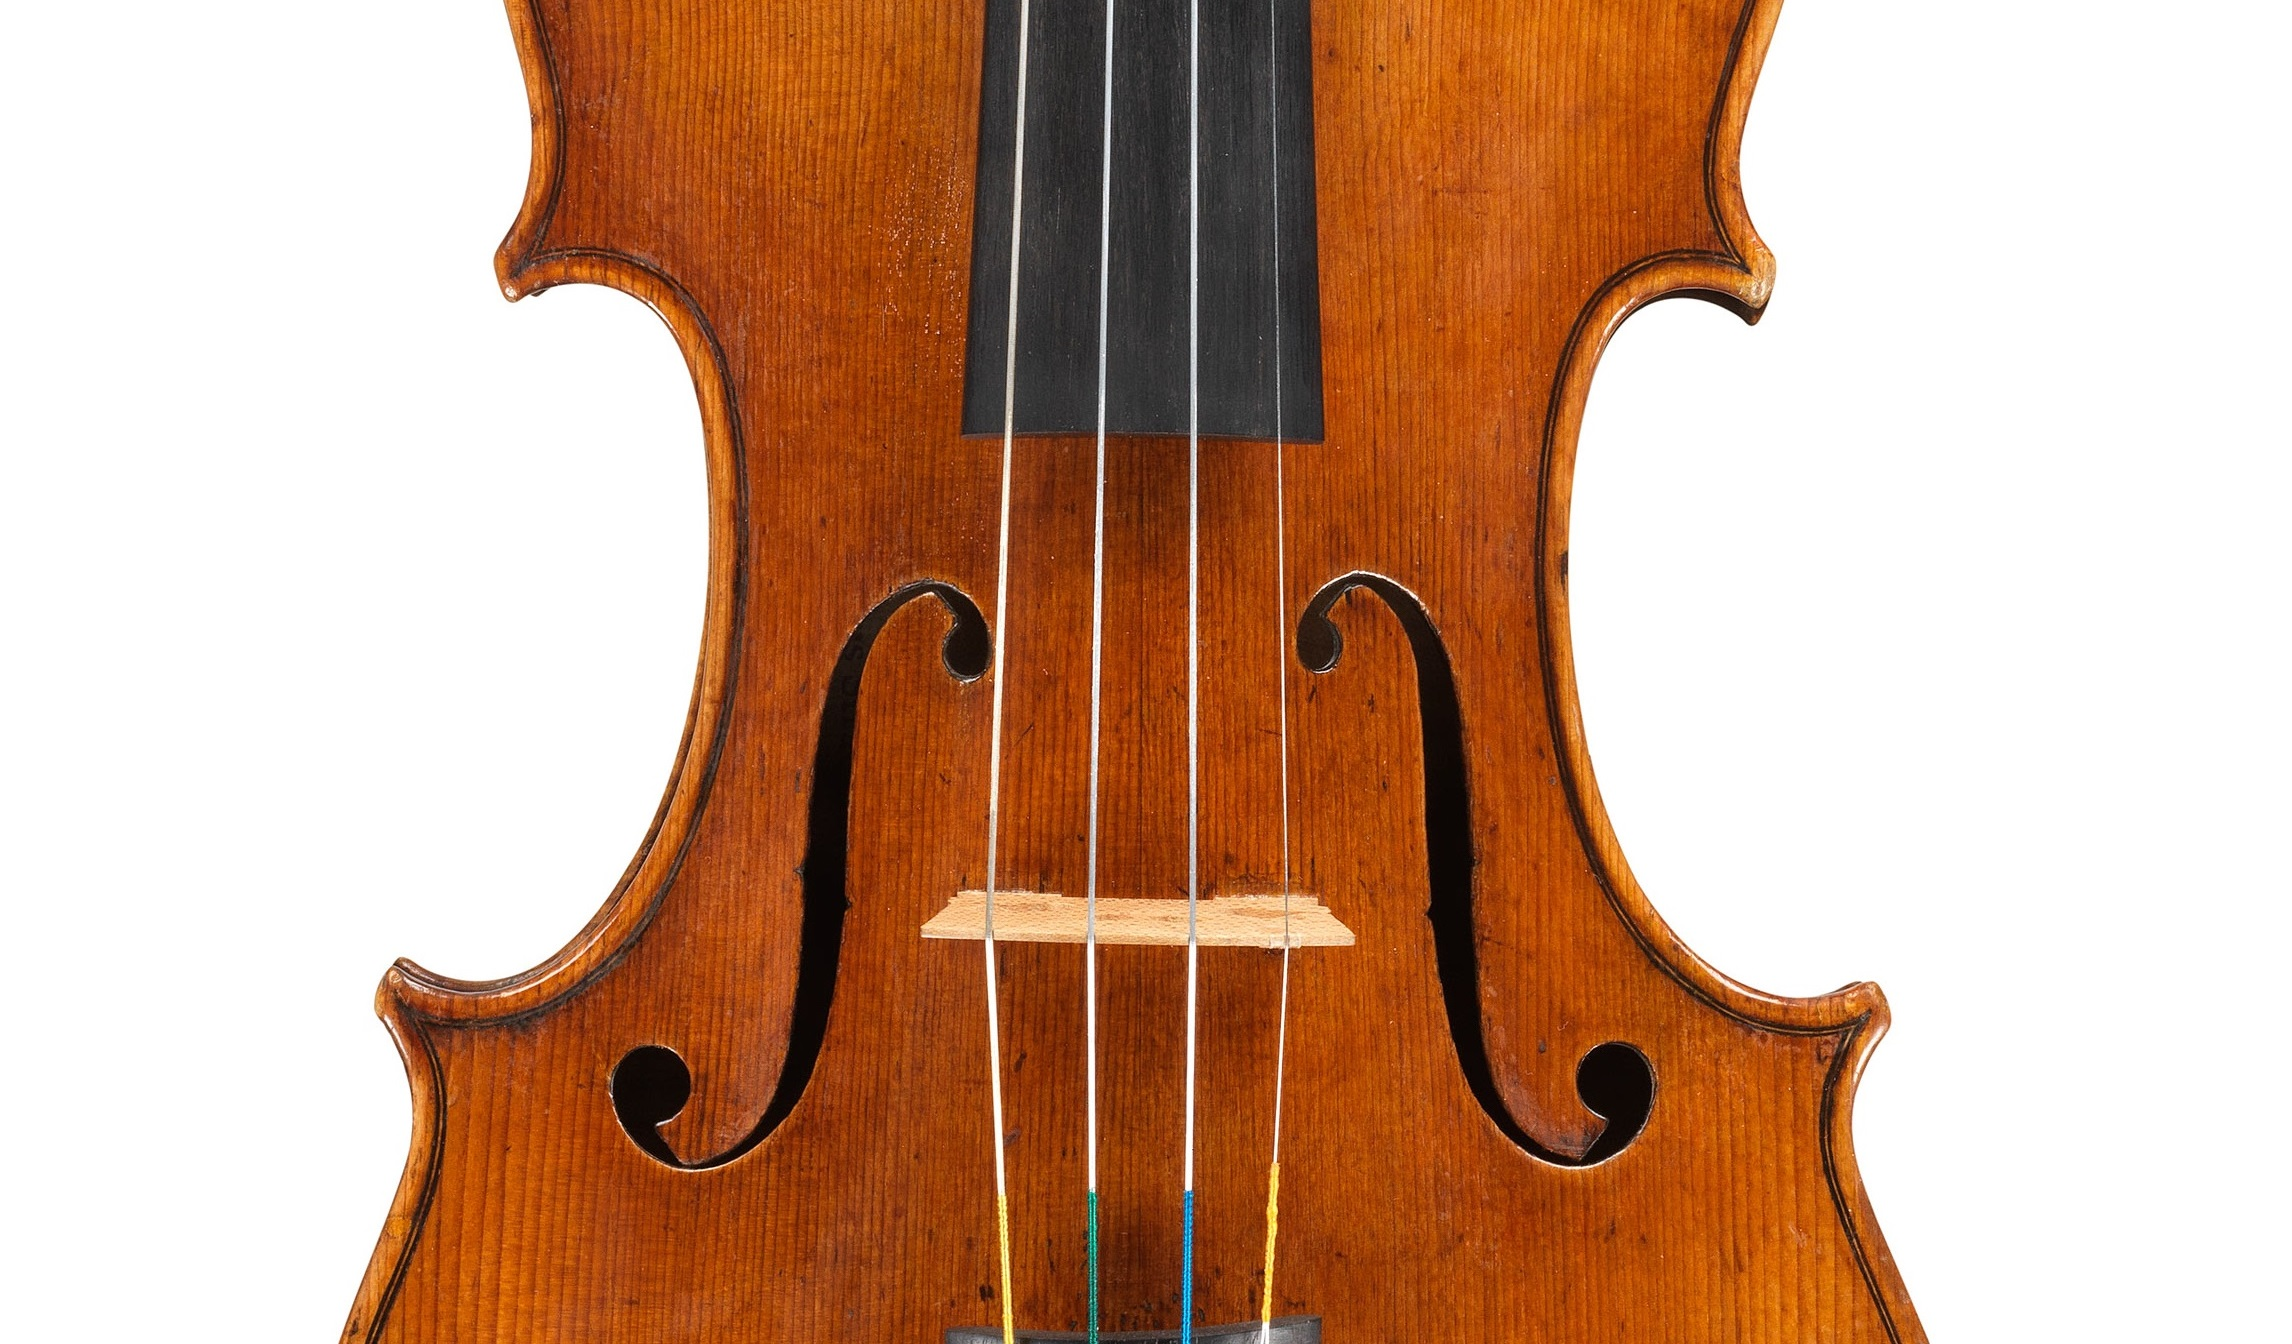 Front of a violin by Antonio Stradivari, ex-Sachs, 1667